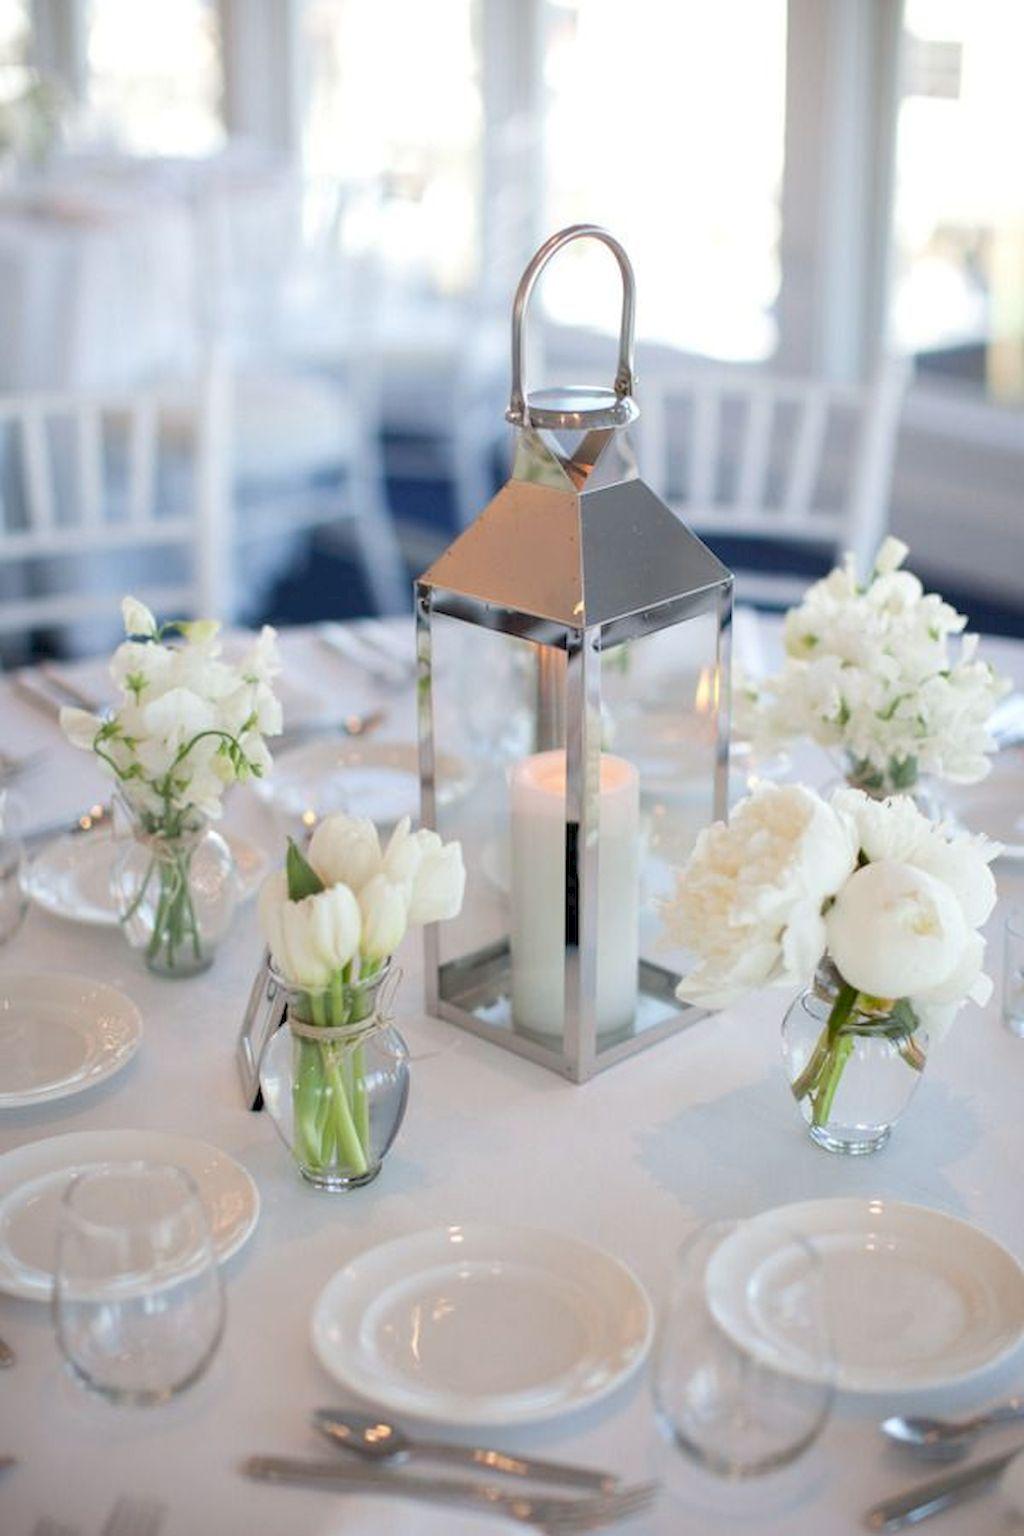 39 Simple White Flower Centerpieces Ideas White Flower